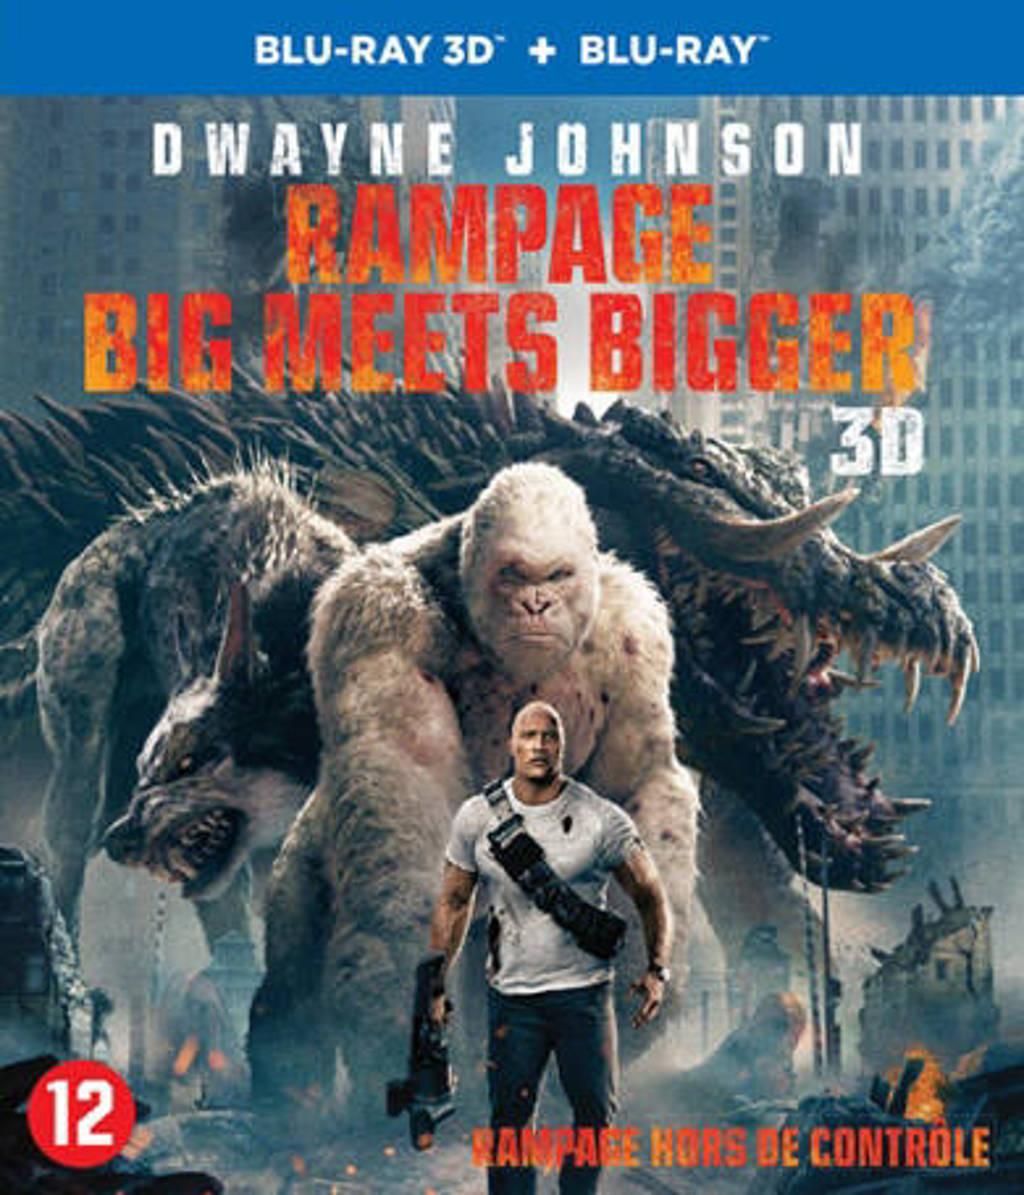 Rampage - Big meets bigger (3D) (Blu-ray)